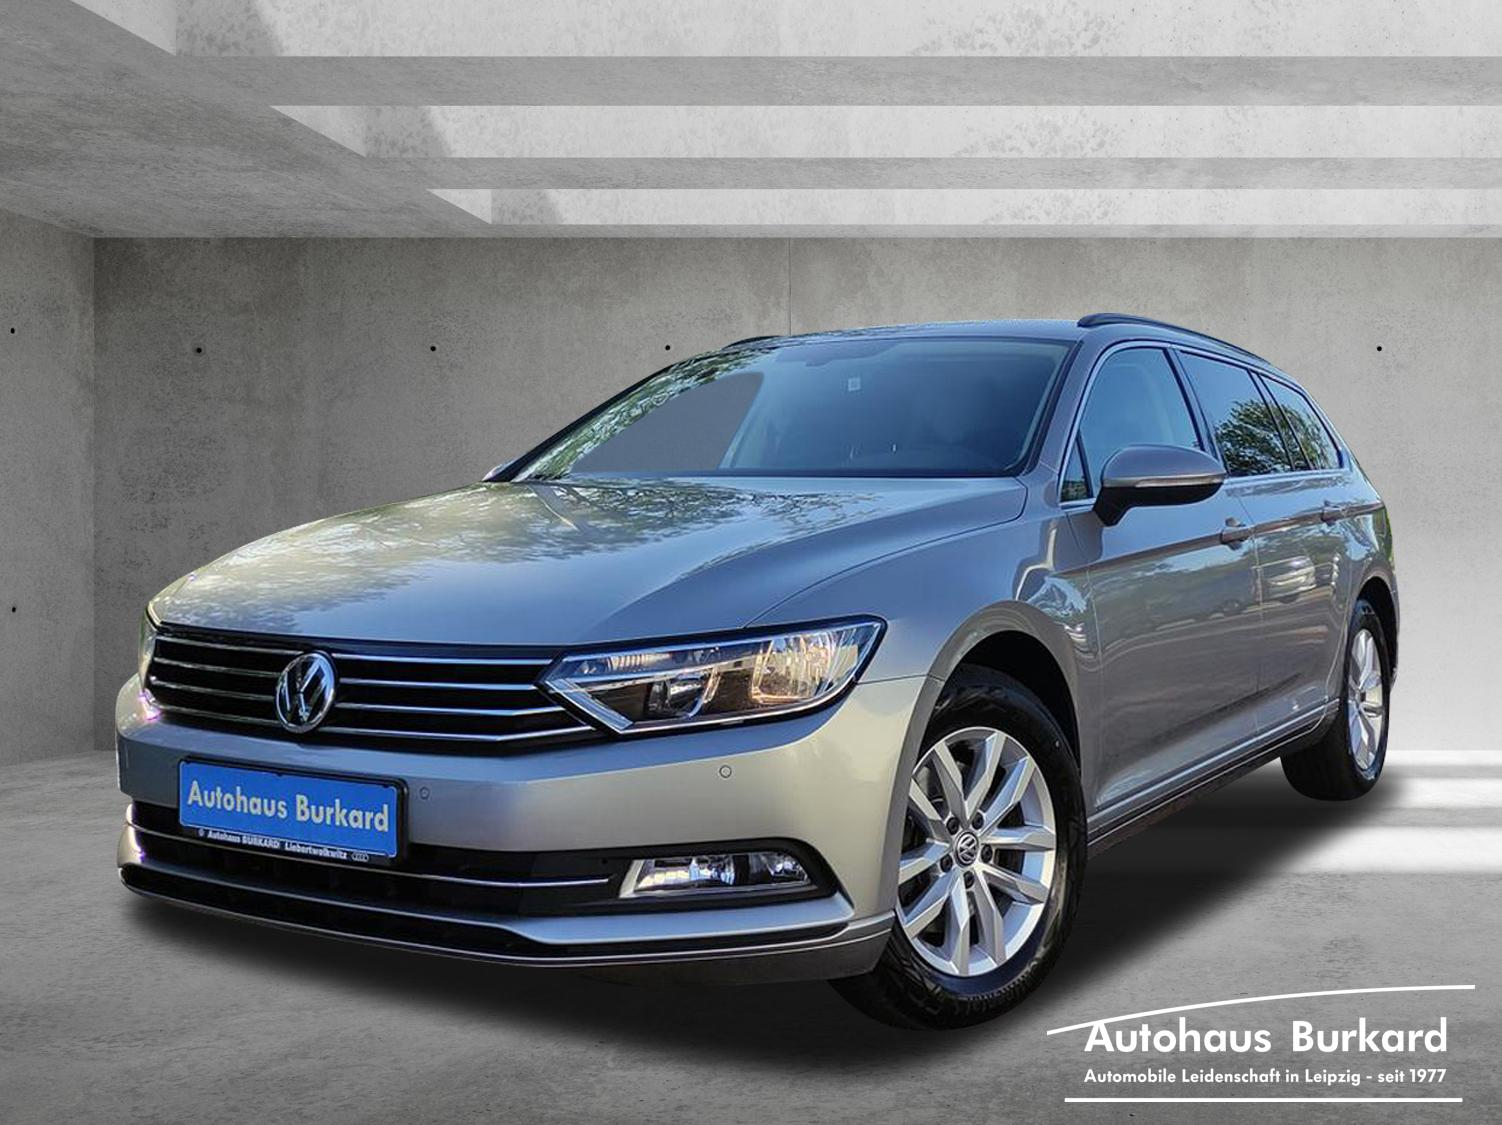 Volkswagen Passat Var. Comfortline 1.6 TDI+AHZV+Navi+PDC, Jahr 2016, Diesel